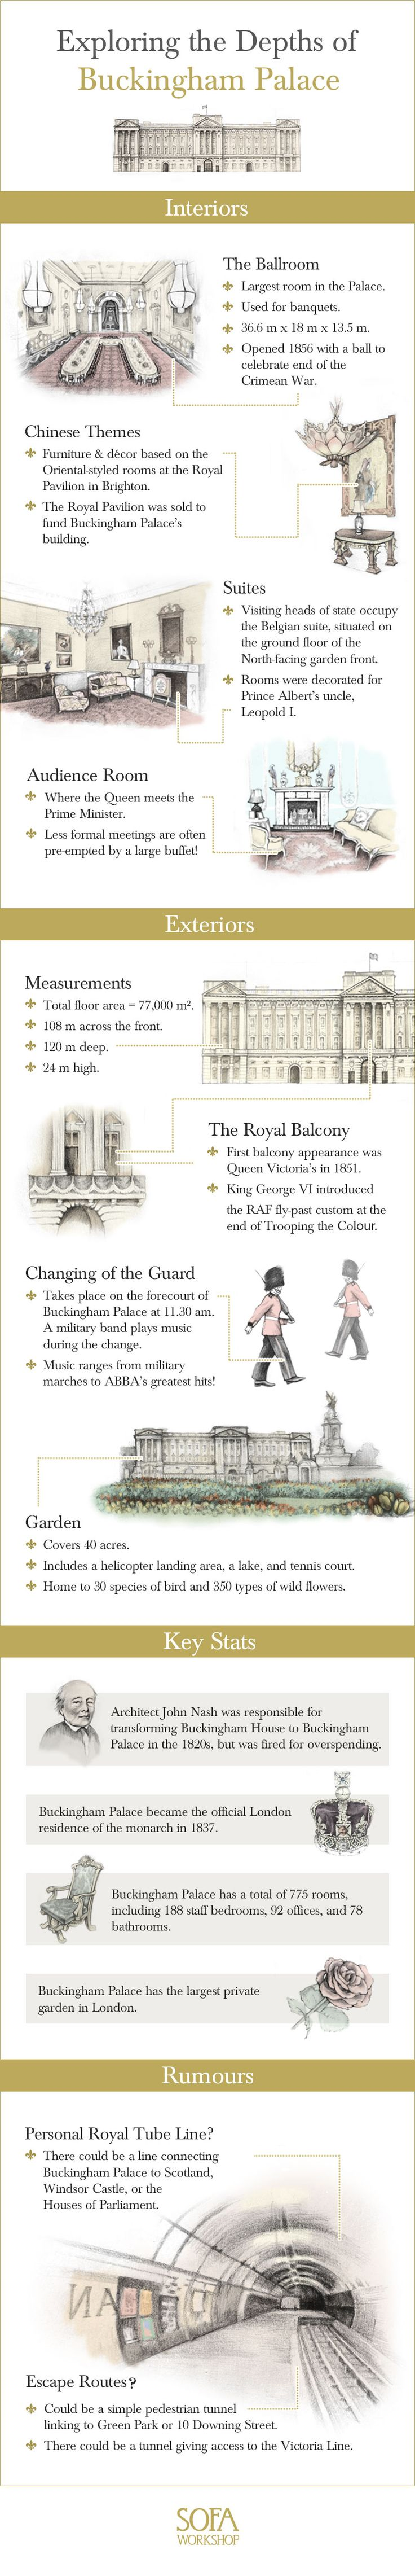 Exploring the Depths of Buckingham Palace #Infographic #InteriorDesign